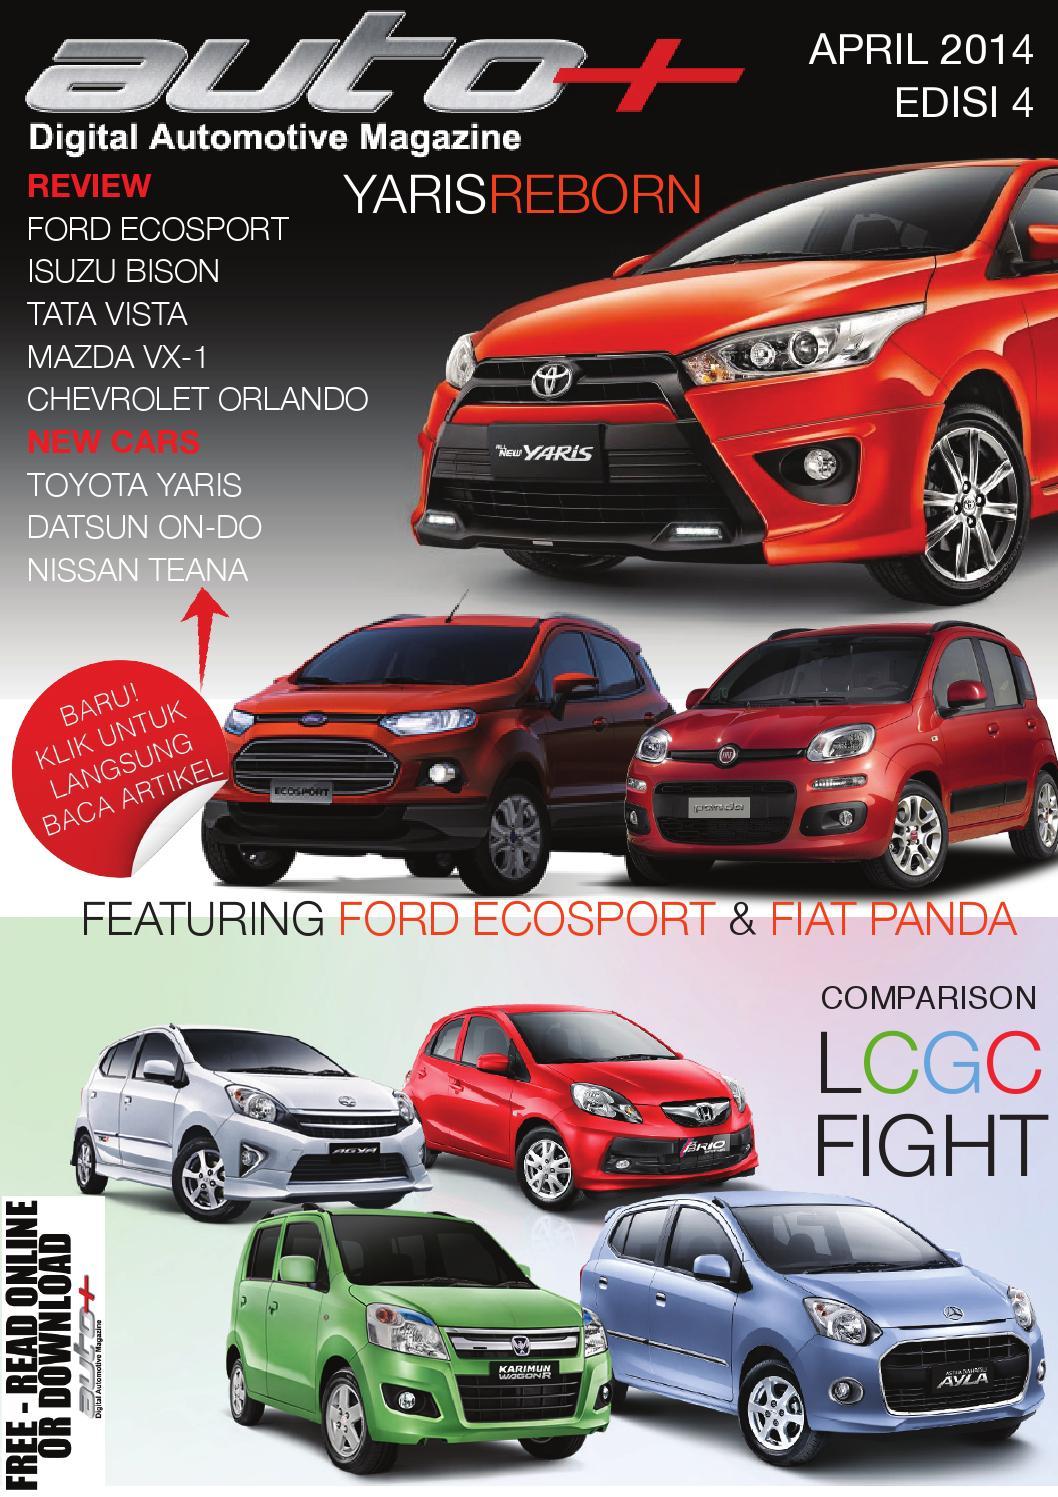 Auto Magazine 04 2014 By Issuu Star Hardware Stiker Petunjuk Stg82 Gambar Buang Sampah